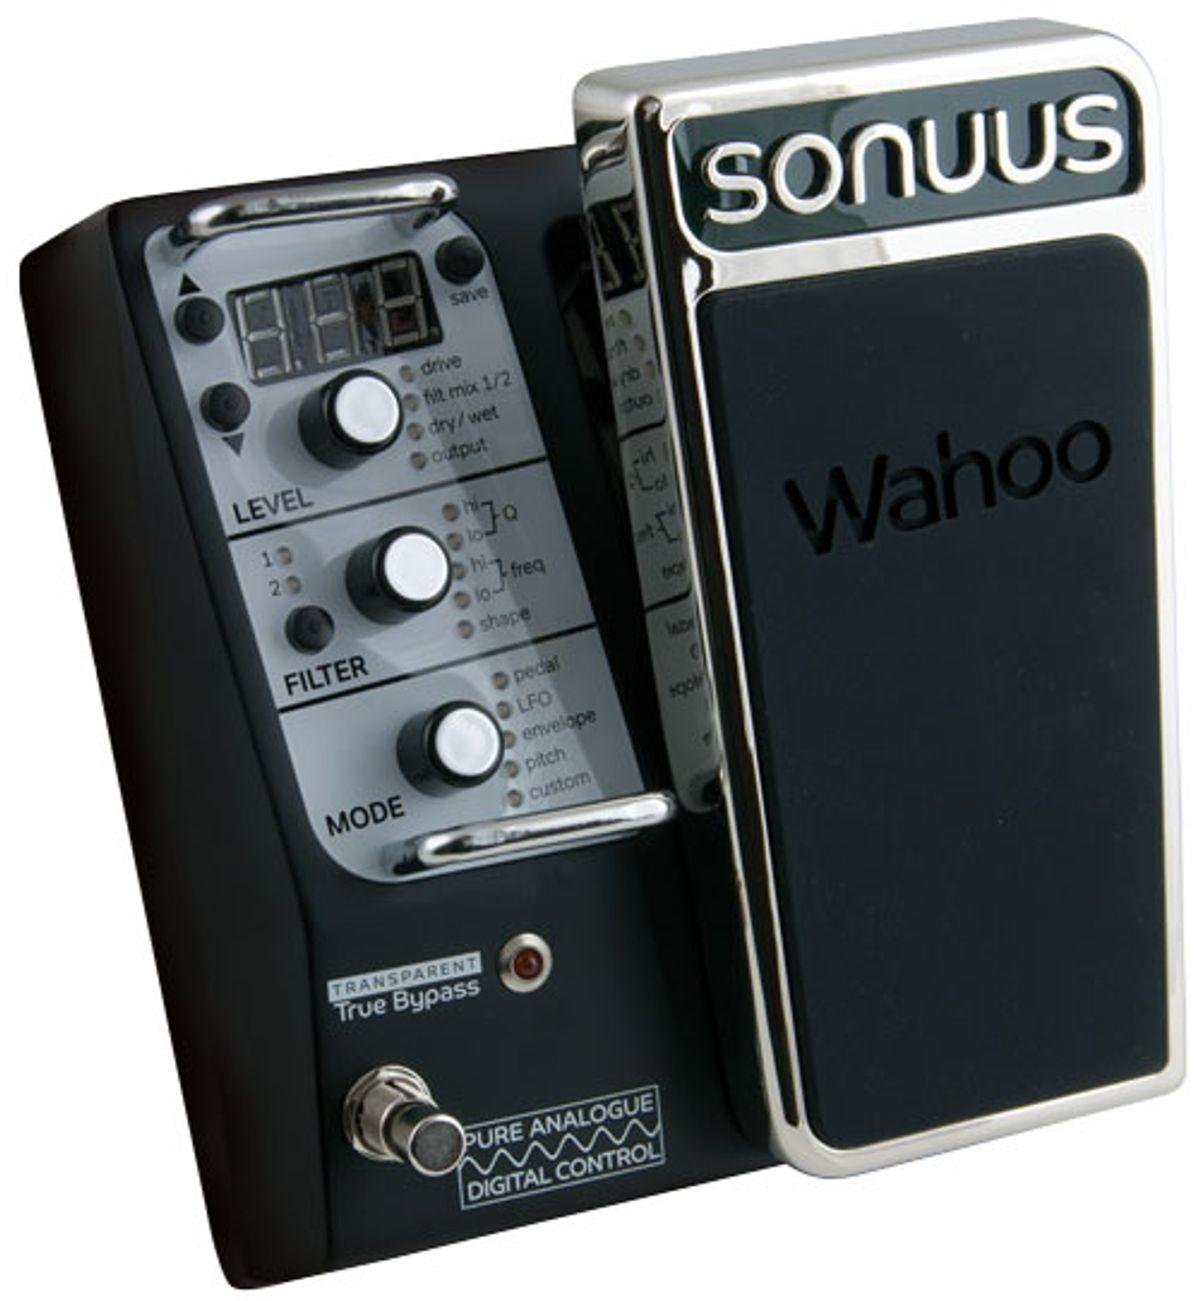 Sonuus Wahoo Pedal Review